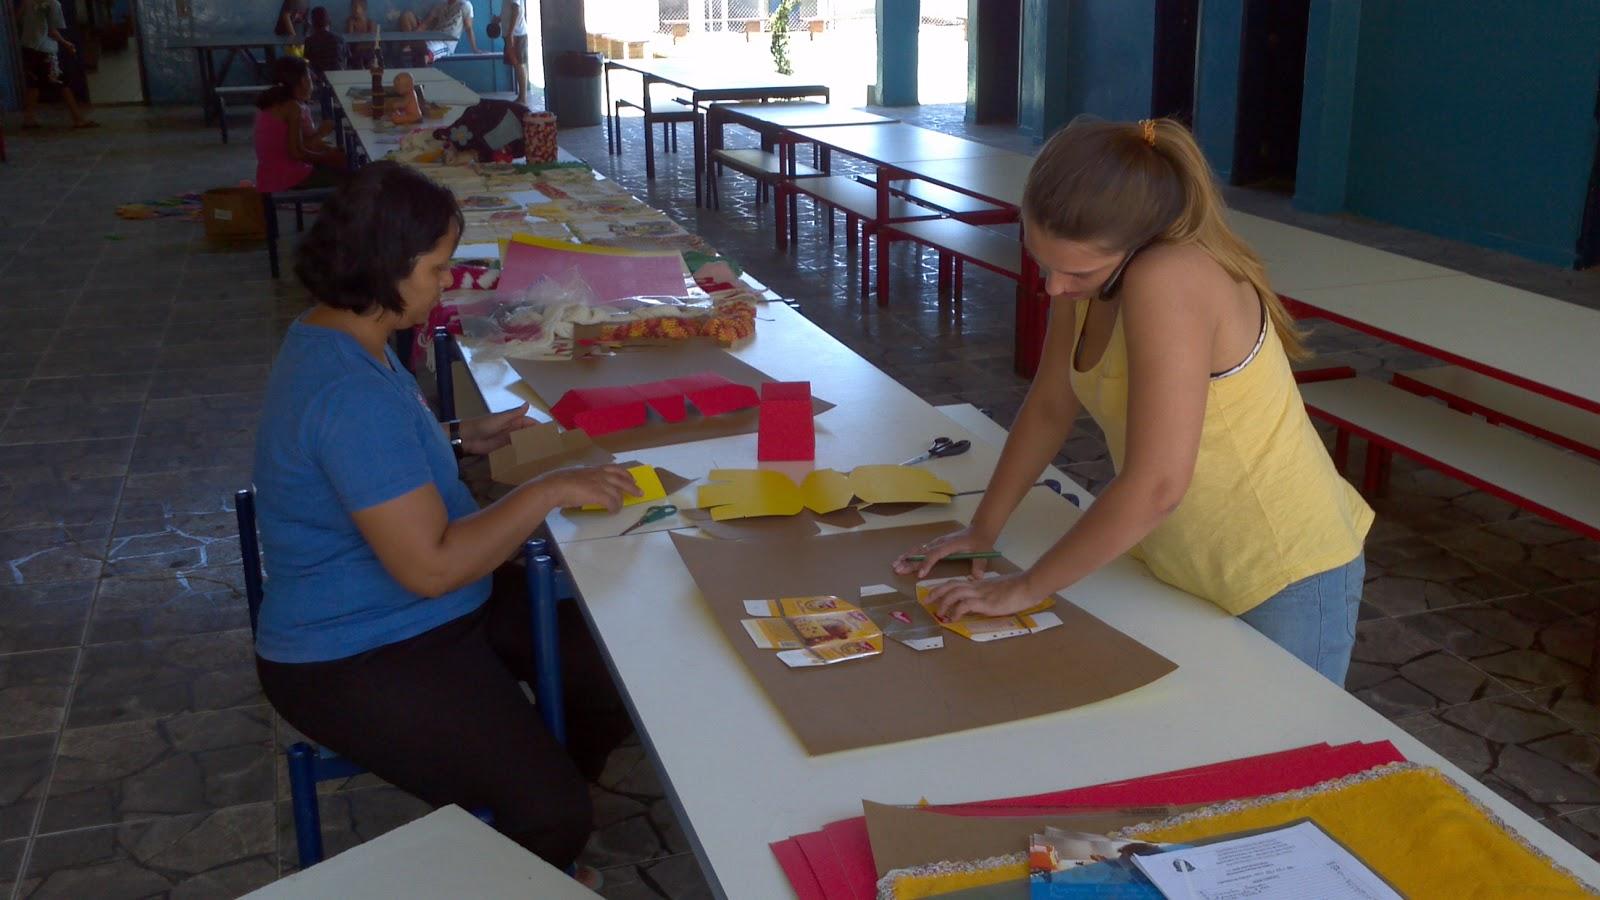 Aida leda oficina de caixas de mini panetones for Oficina de caixa